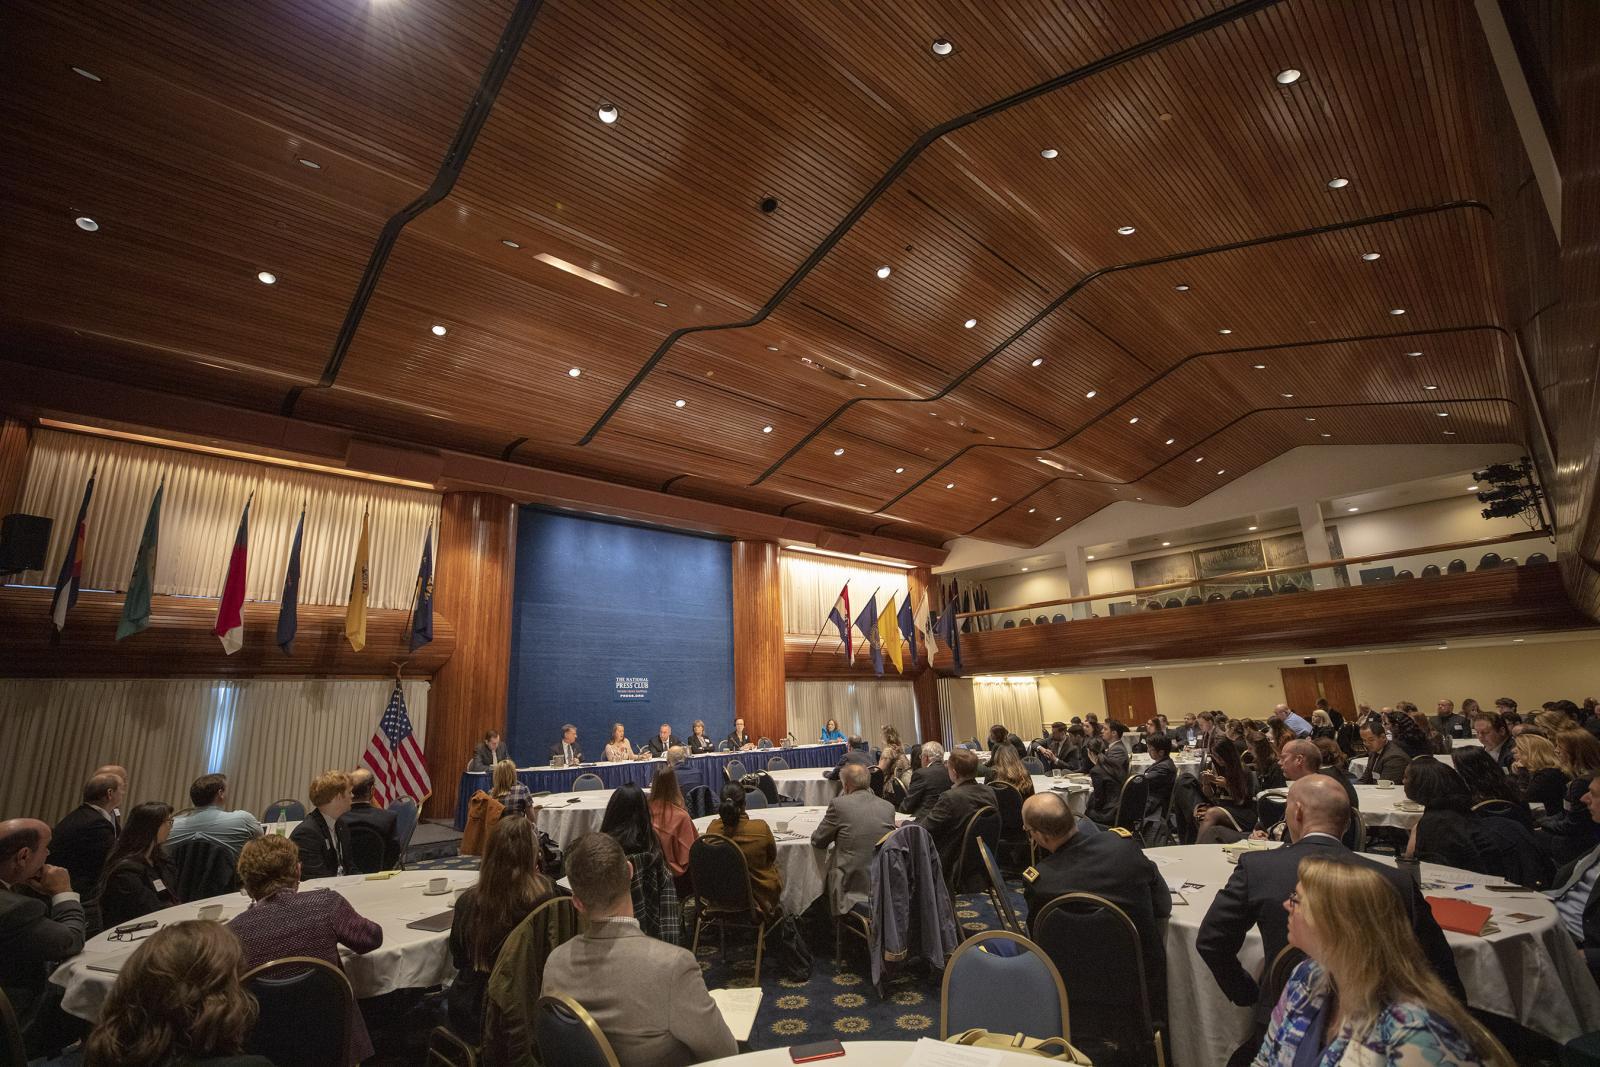 Nebraska Space Law Conference, Washington DC 2019